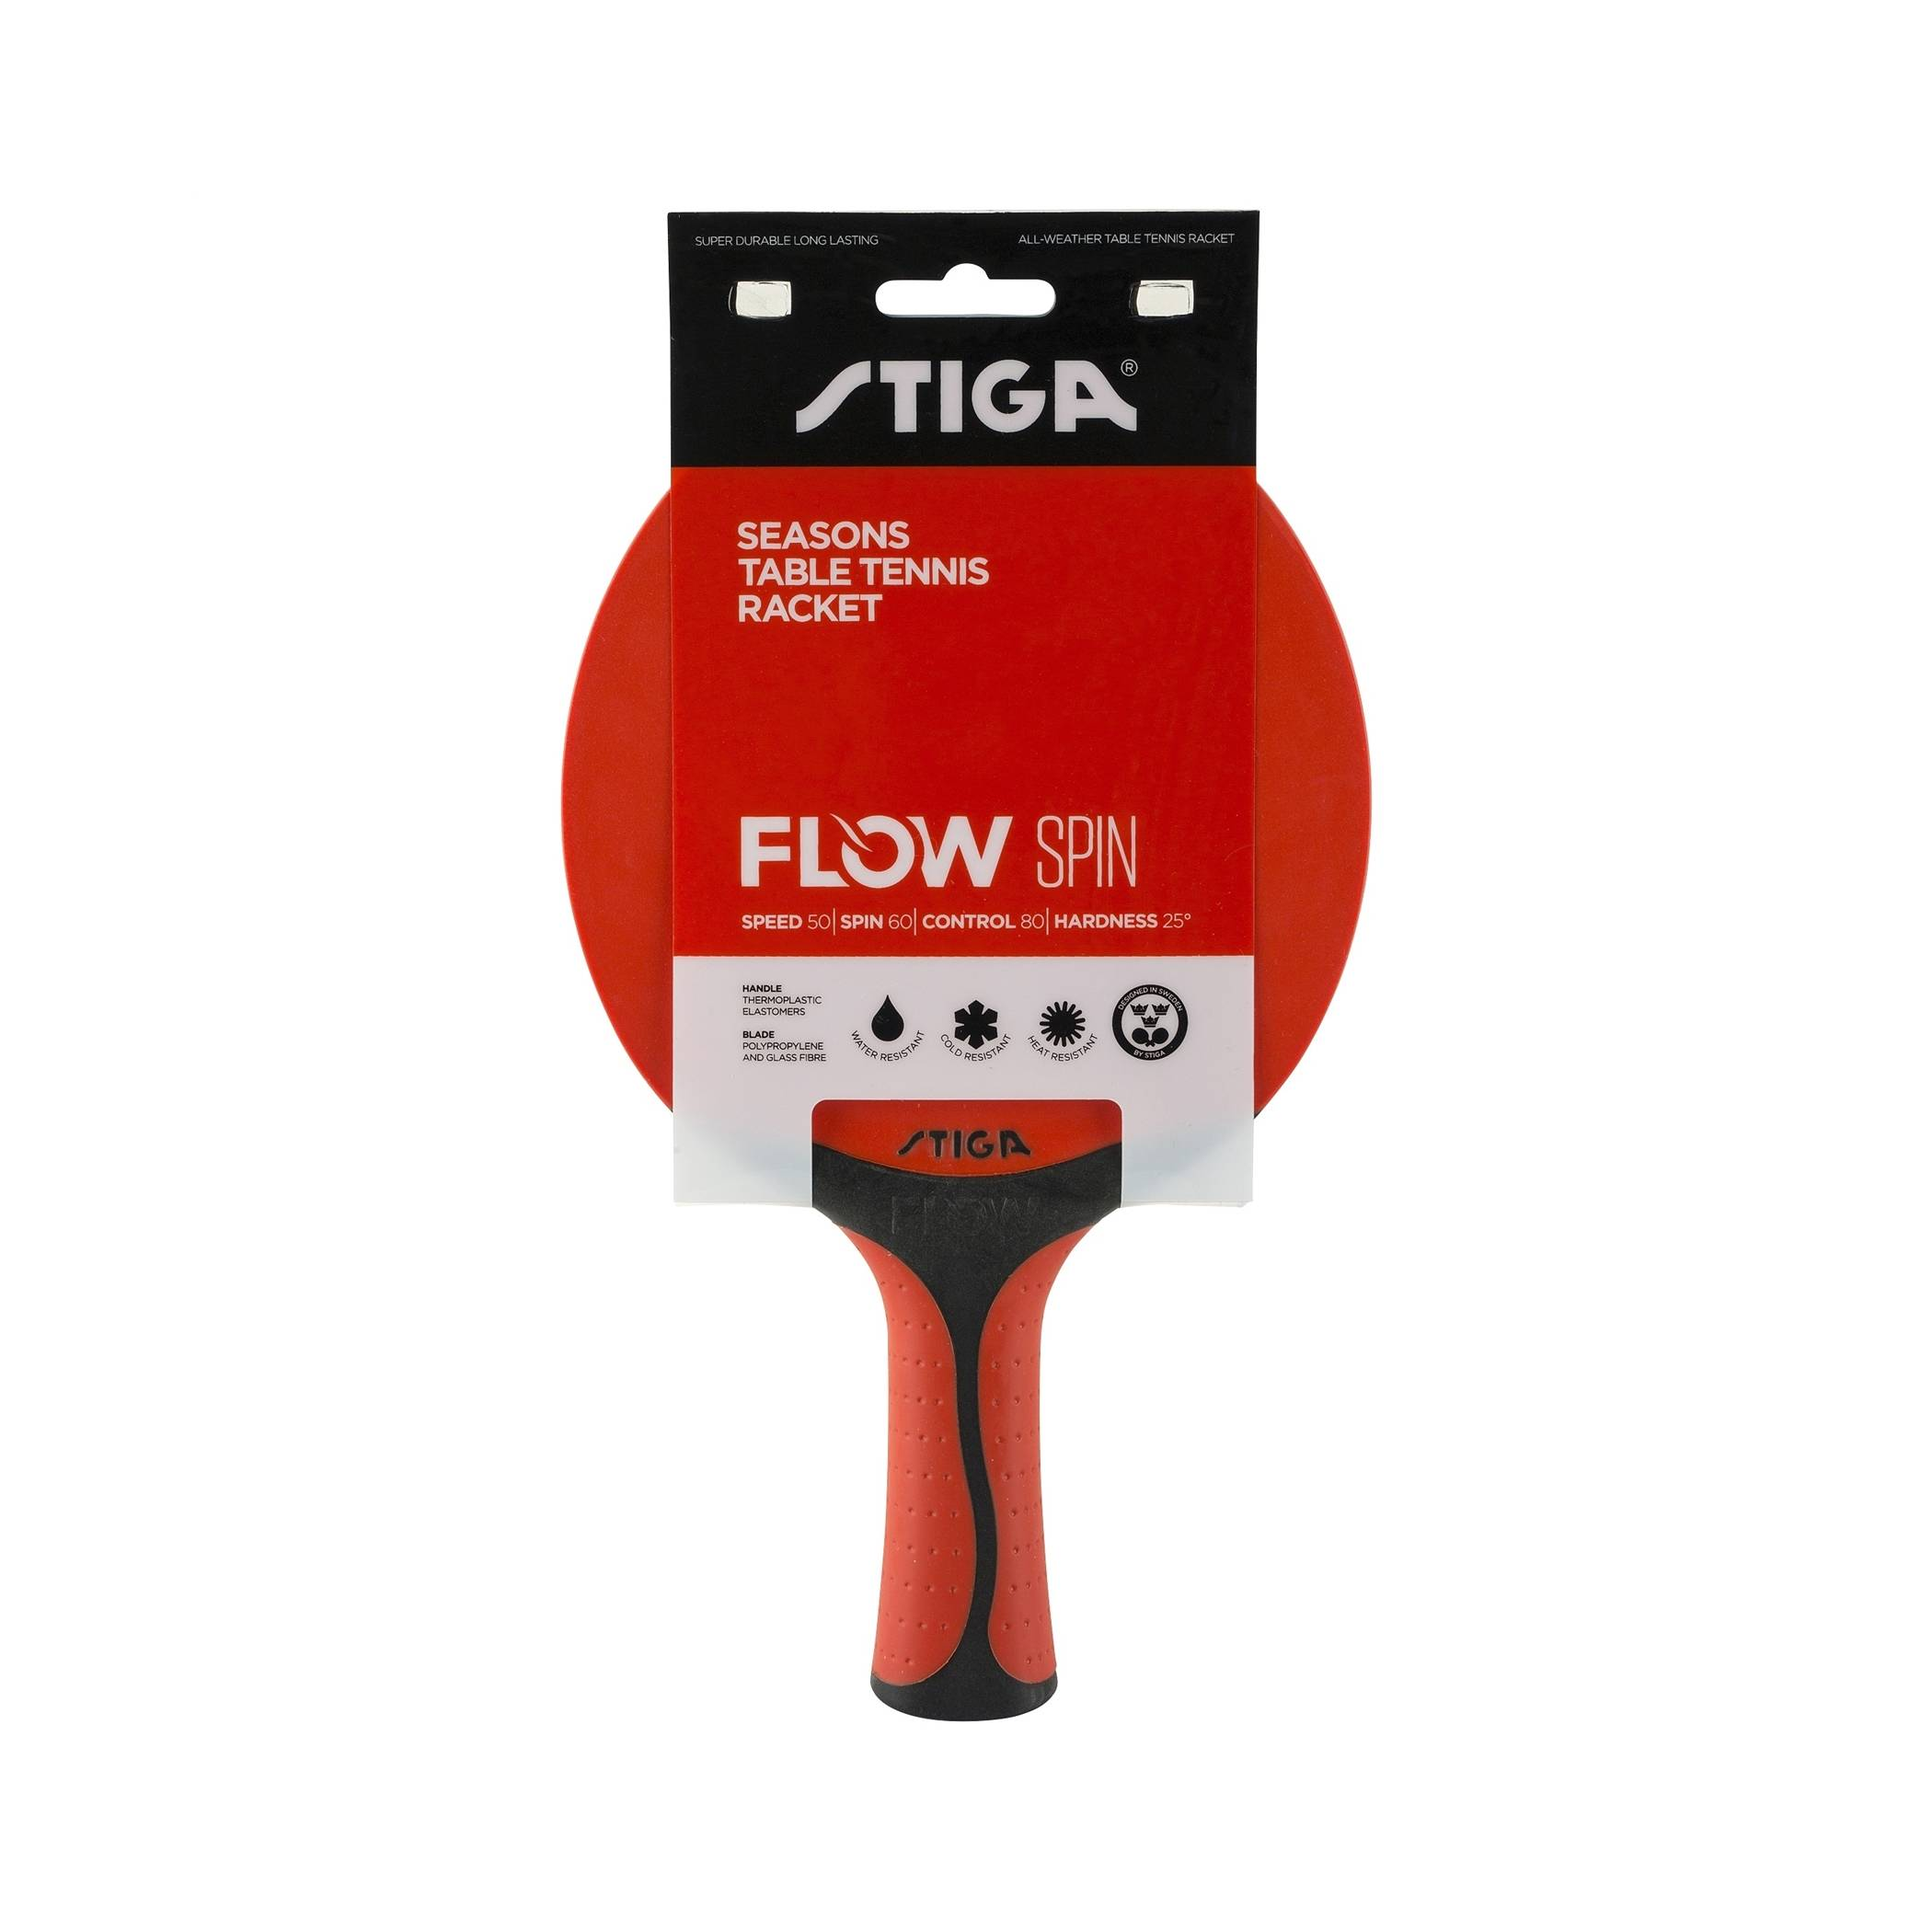 Stiga Flow Spin Red/Black